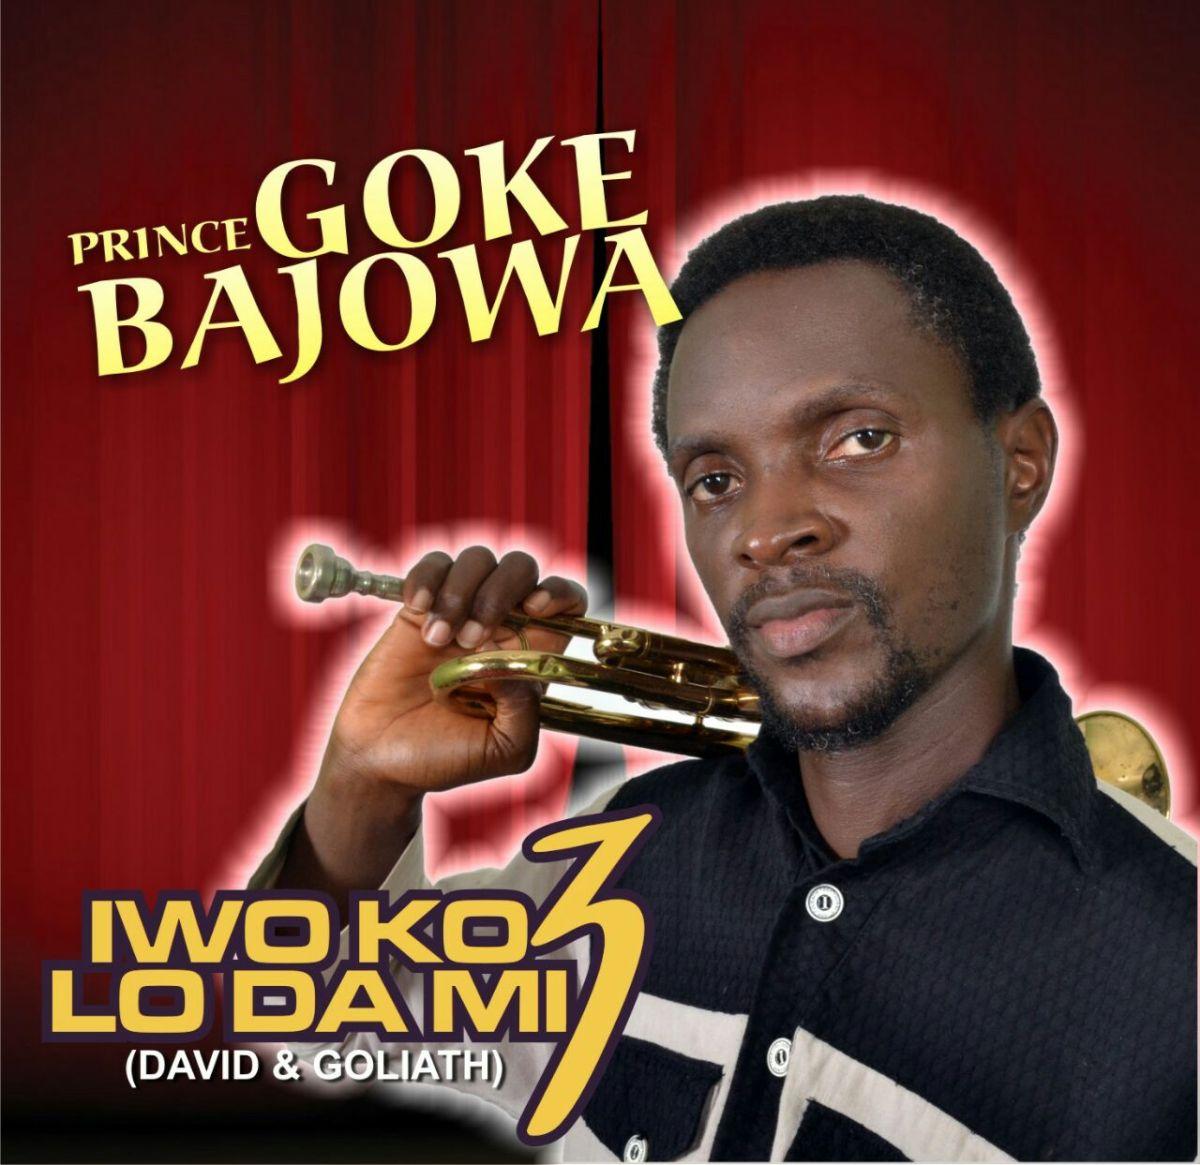 Music: Goke Bajowa - Iwo Ko Lo Dami + Carry me dey go | @GokeGokeBajowa Cc @pure_praises |Download